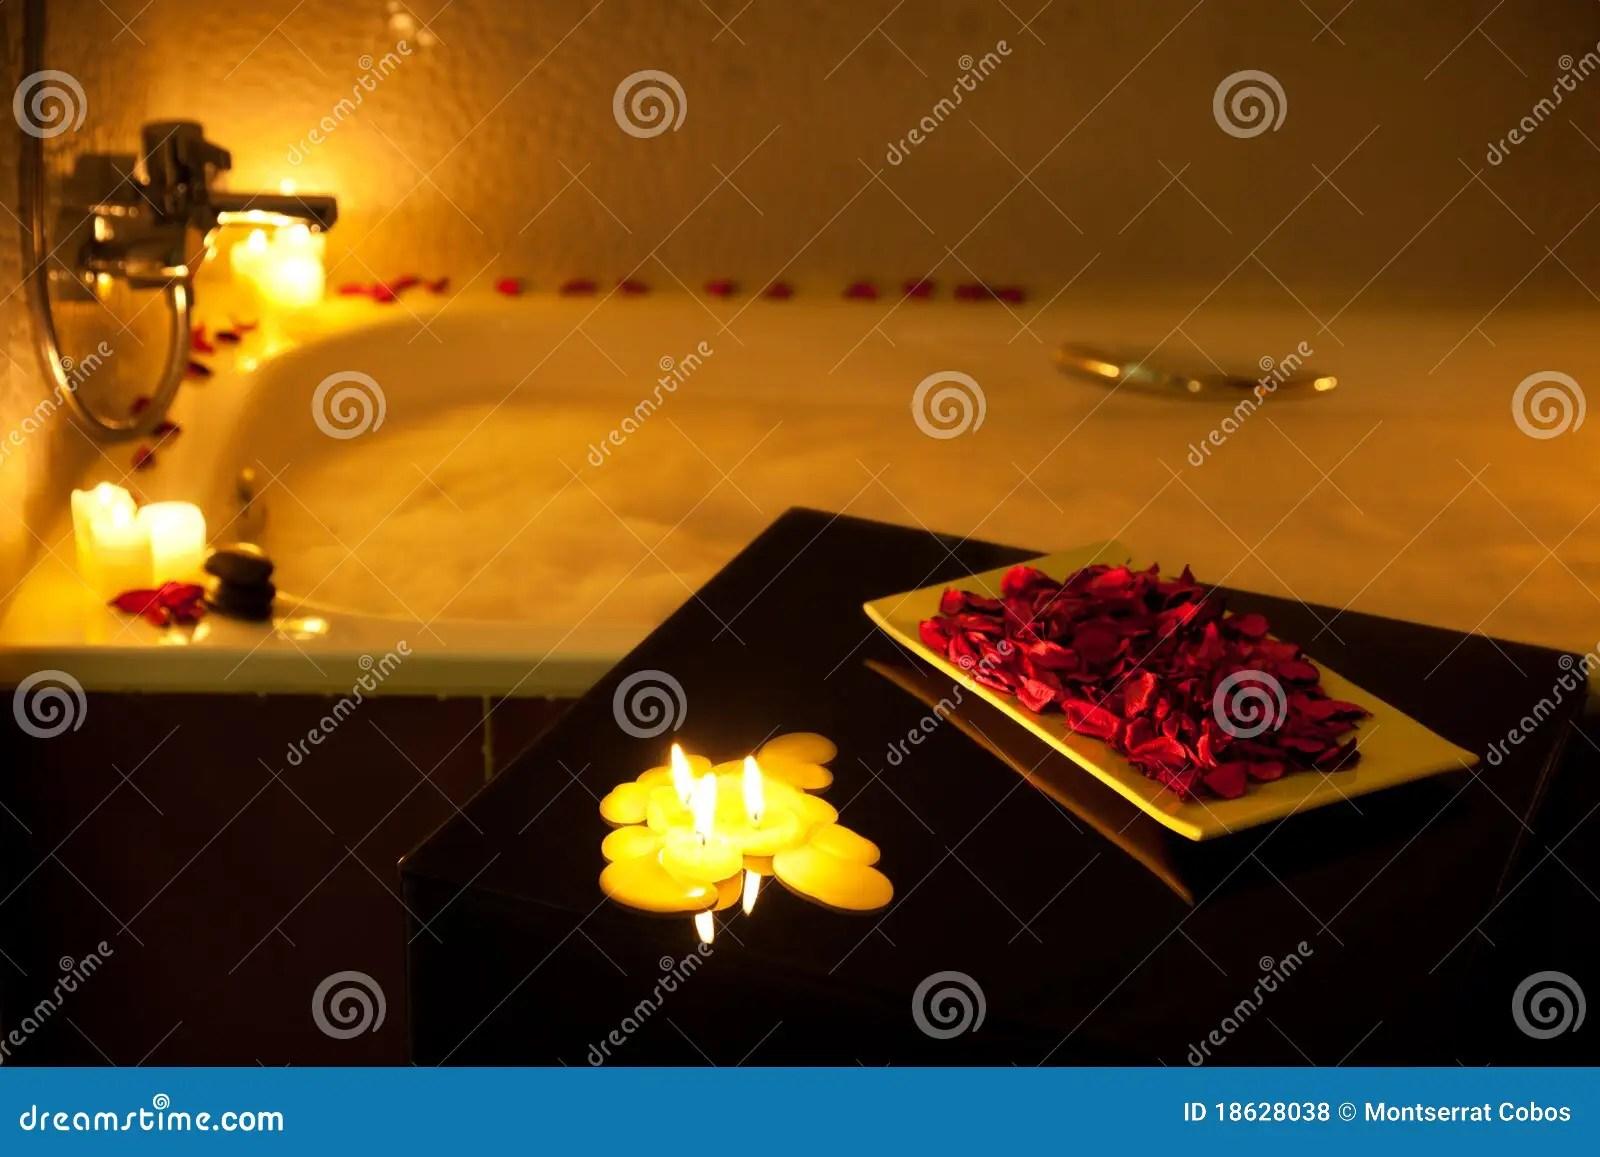 Romantic Bathtub Royalty Free Stock Photos Image 18628038